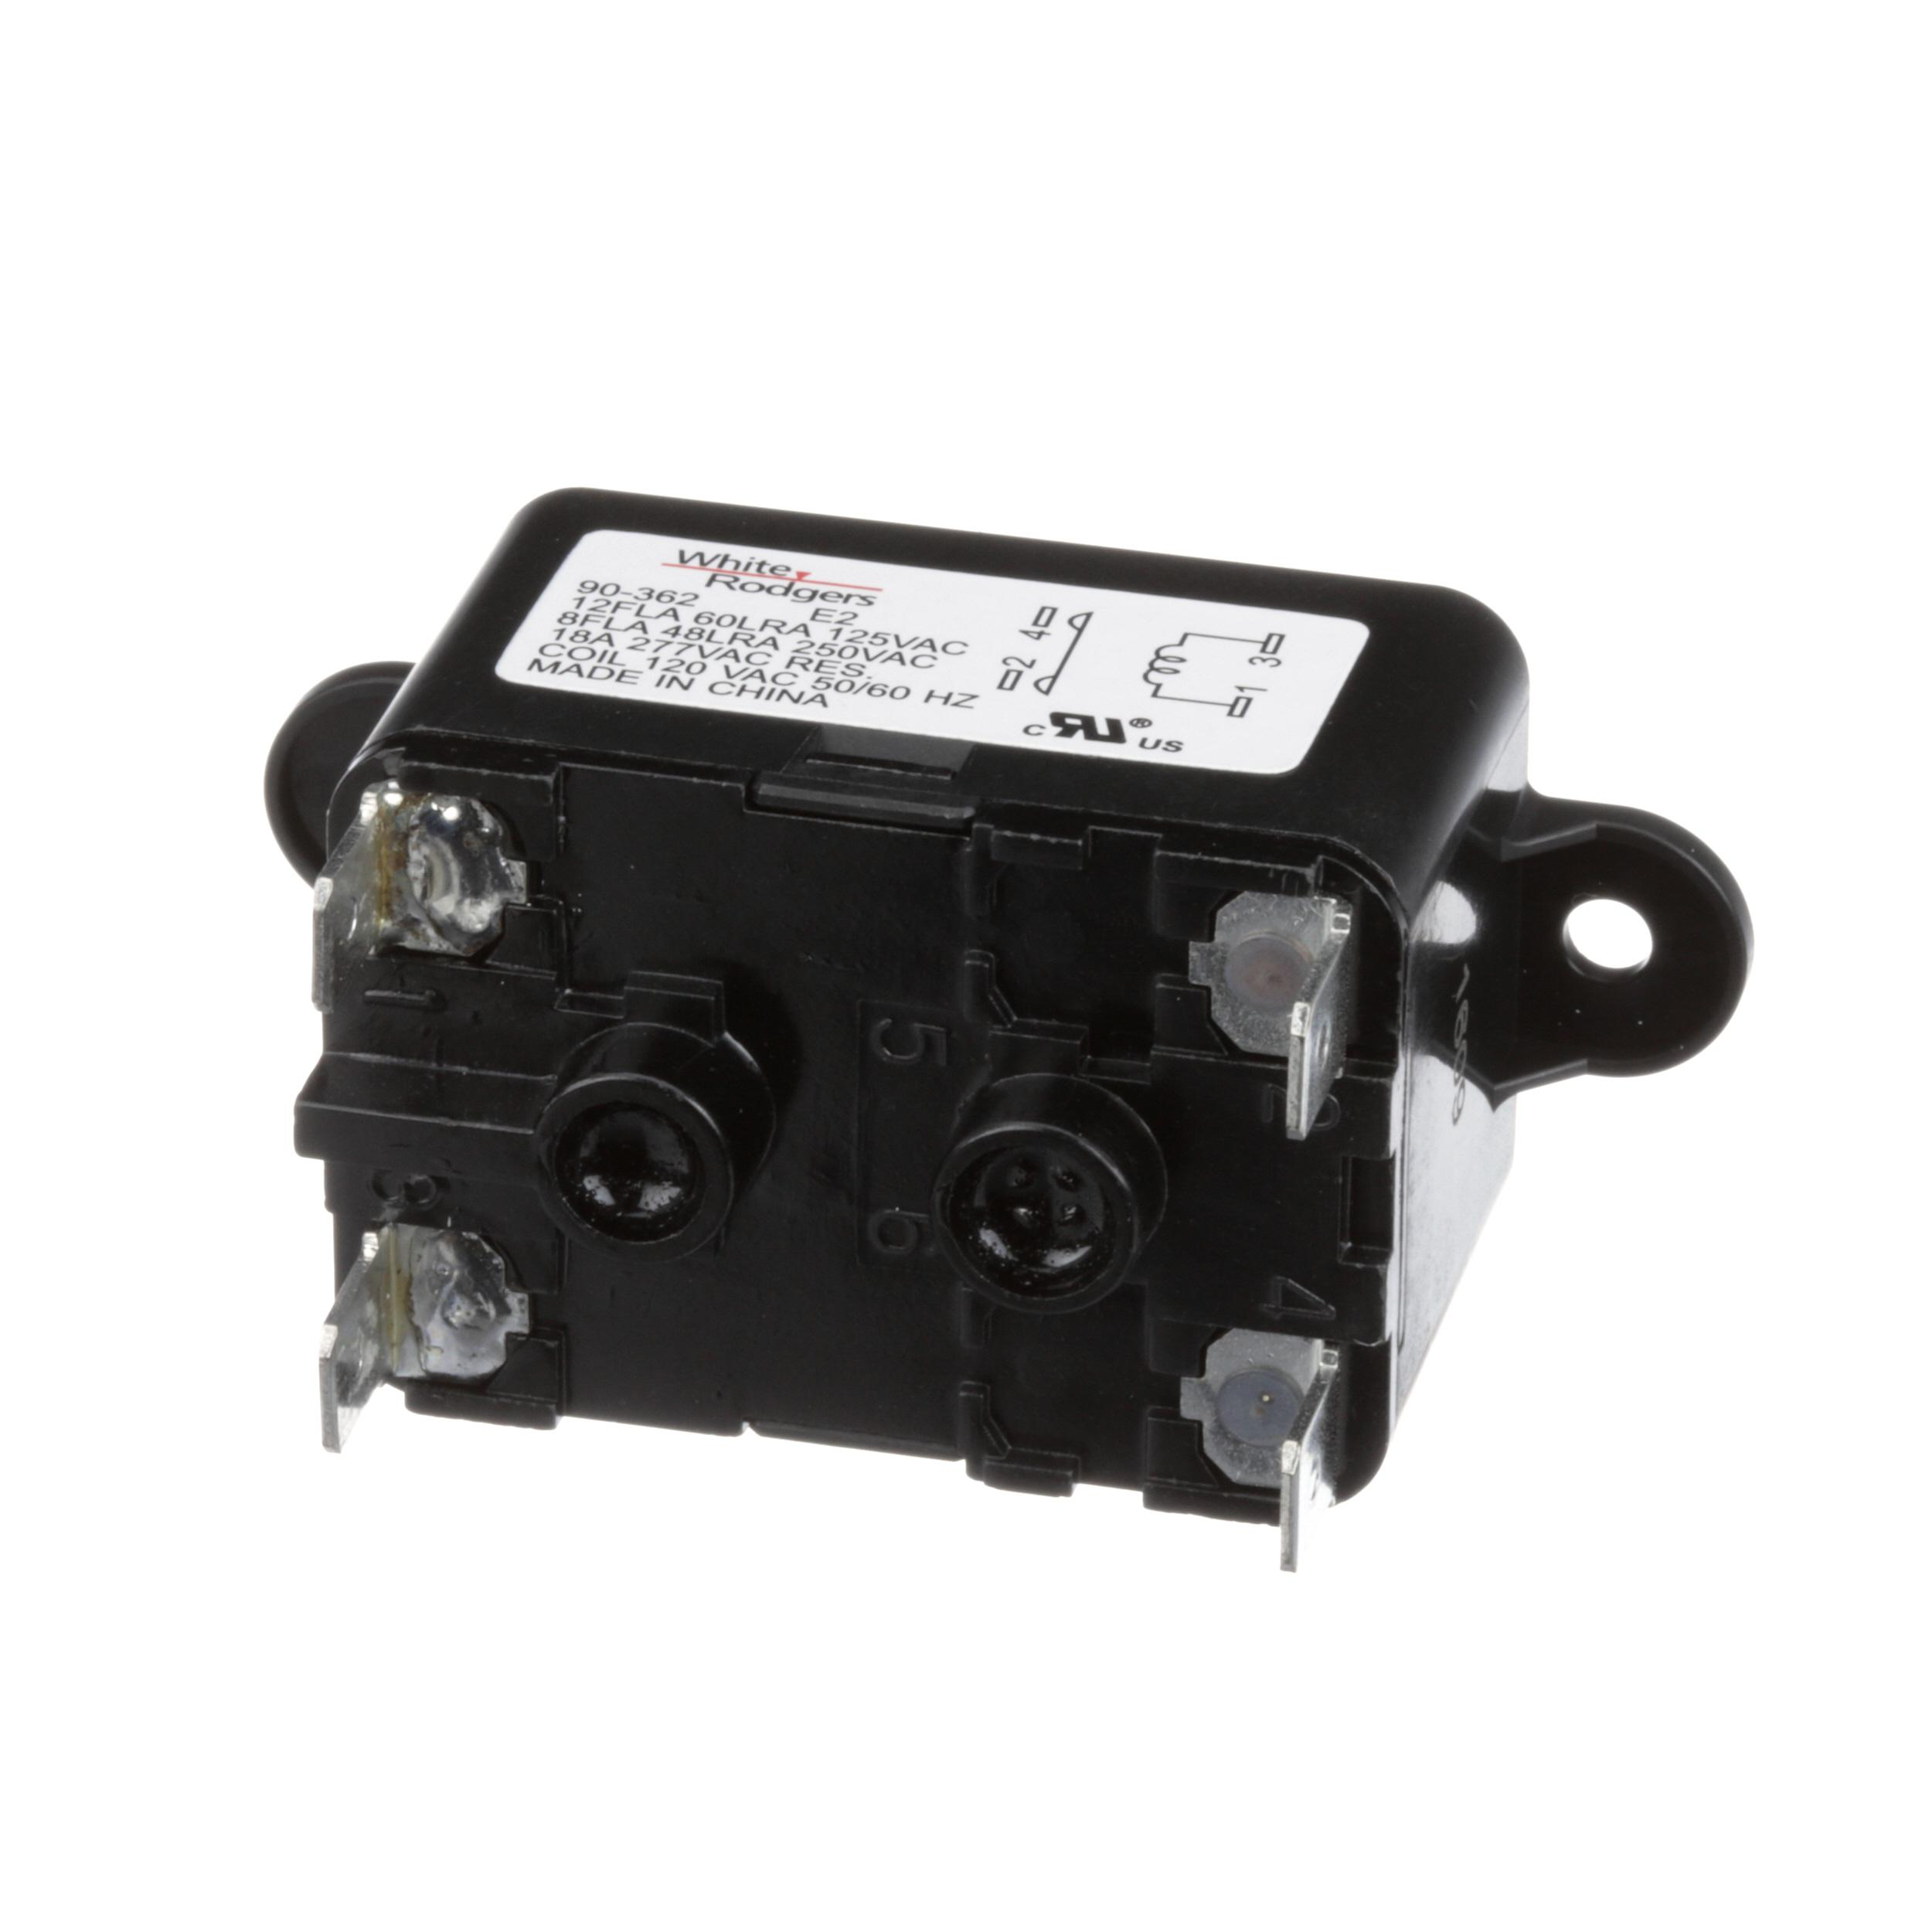 Ultrafryer Systems Relay 120v Ac Motor Start W 60 Lra